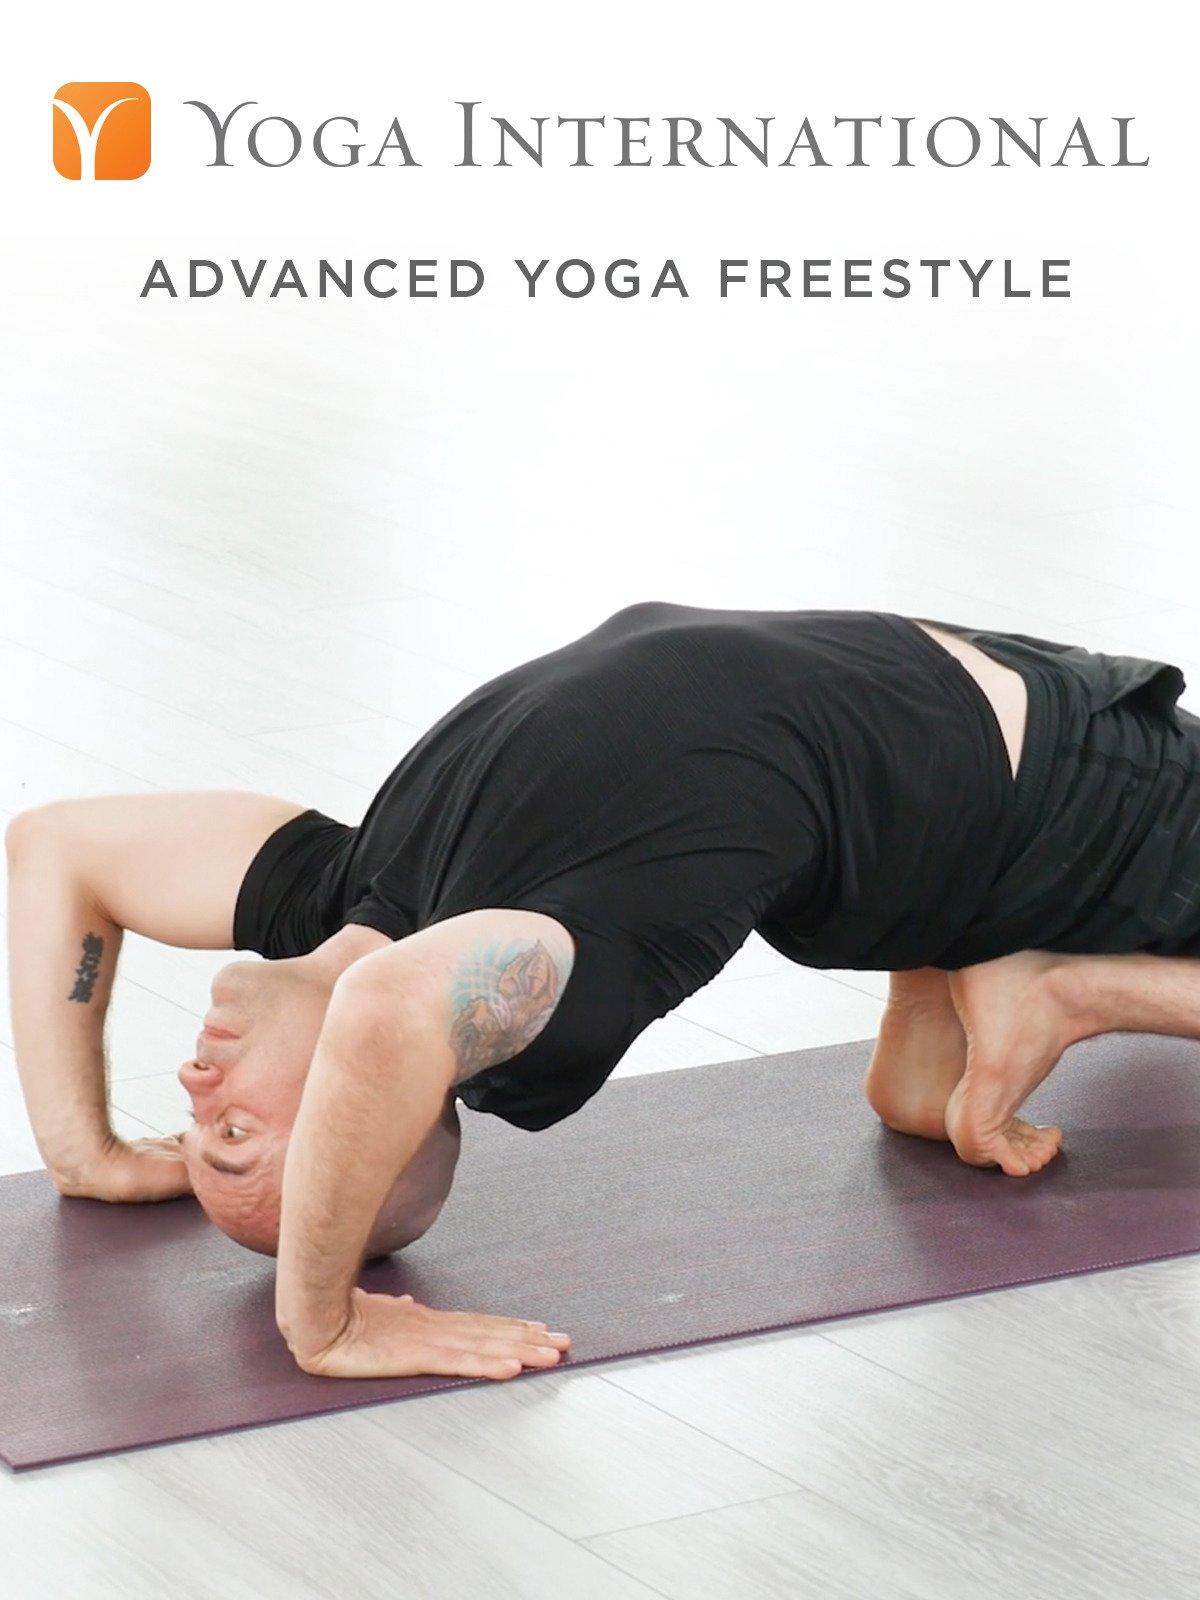 Advanced Yoga Freestyle